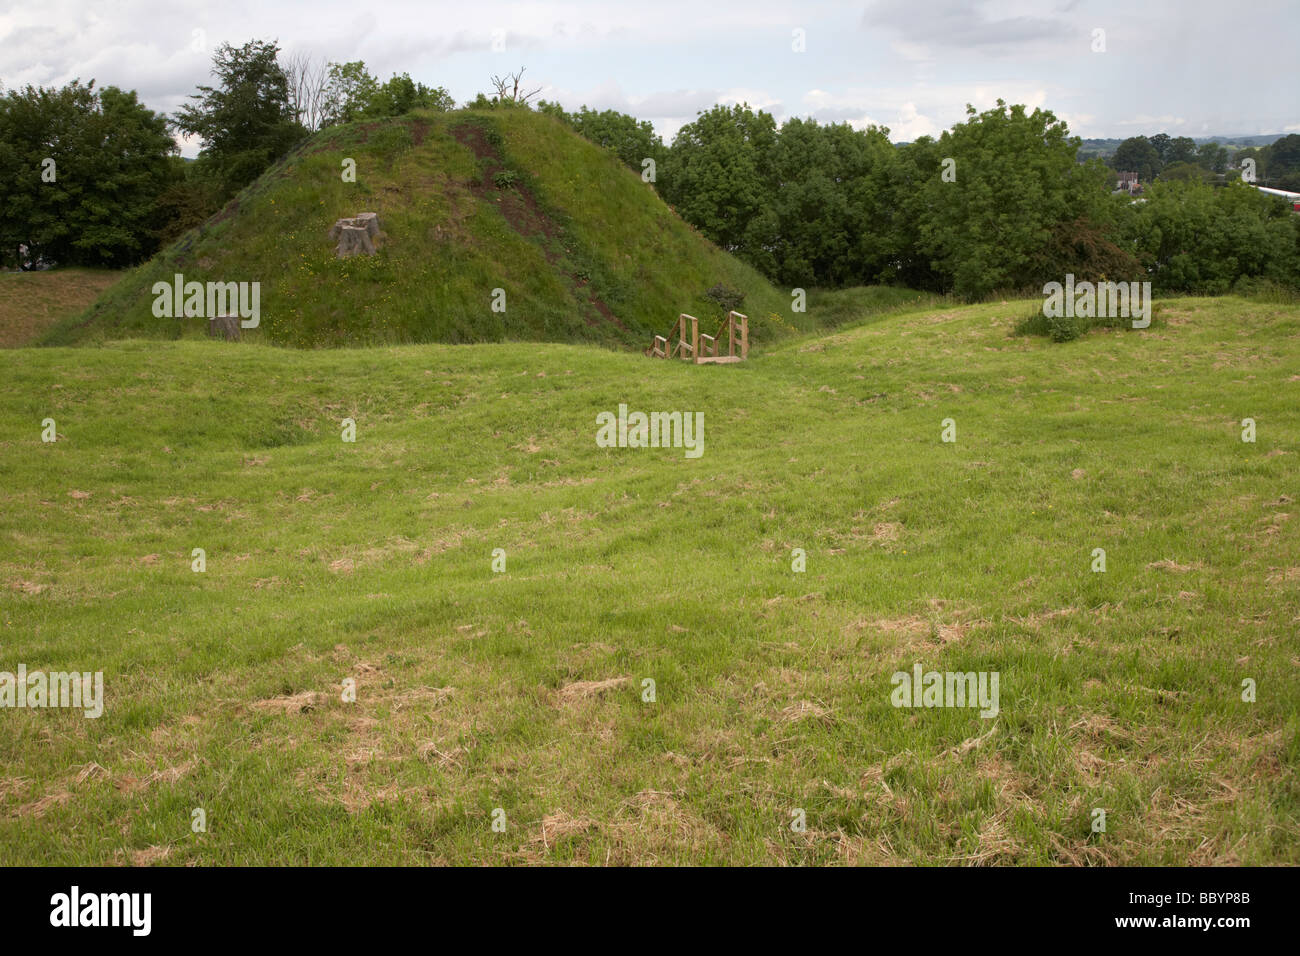 harryville motte and bailey 12th century earthwork ballymena county antrim northern ireland - Stock Image